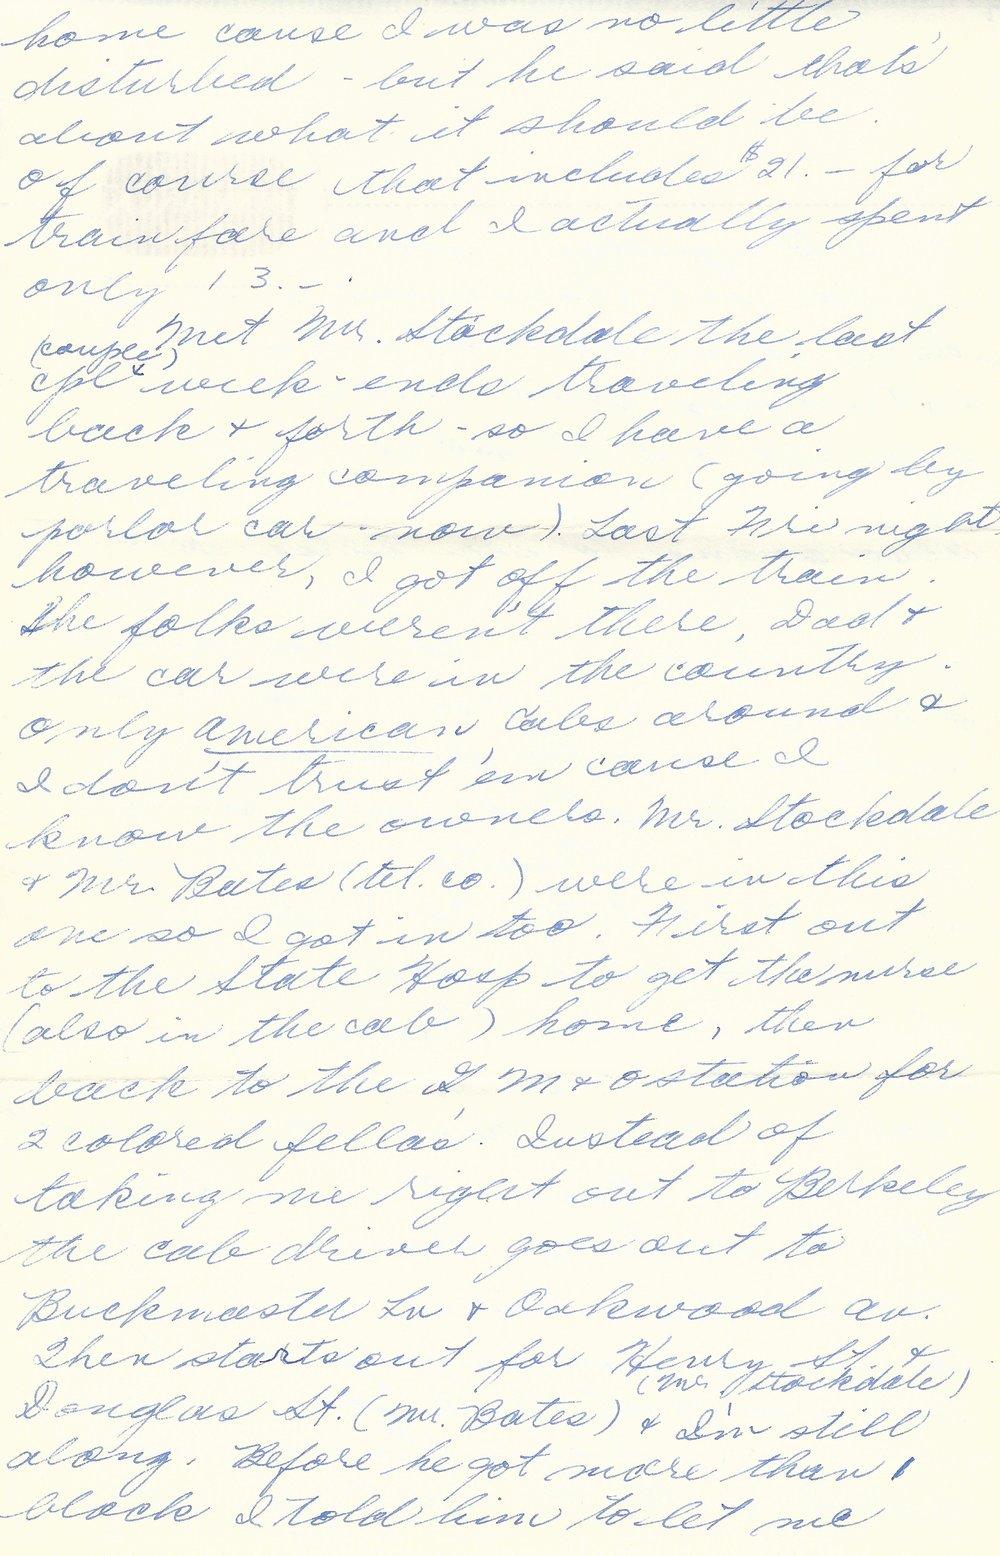 7. Oct. 9-21, 1952 (Oma)_Page_07.jpg